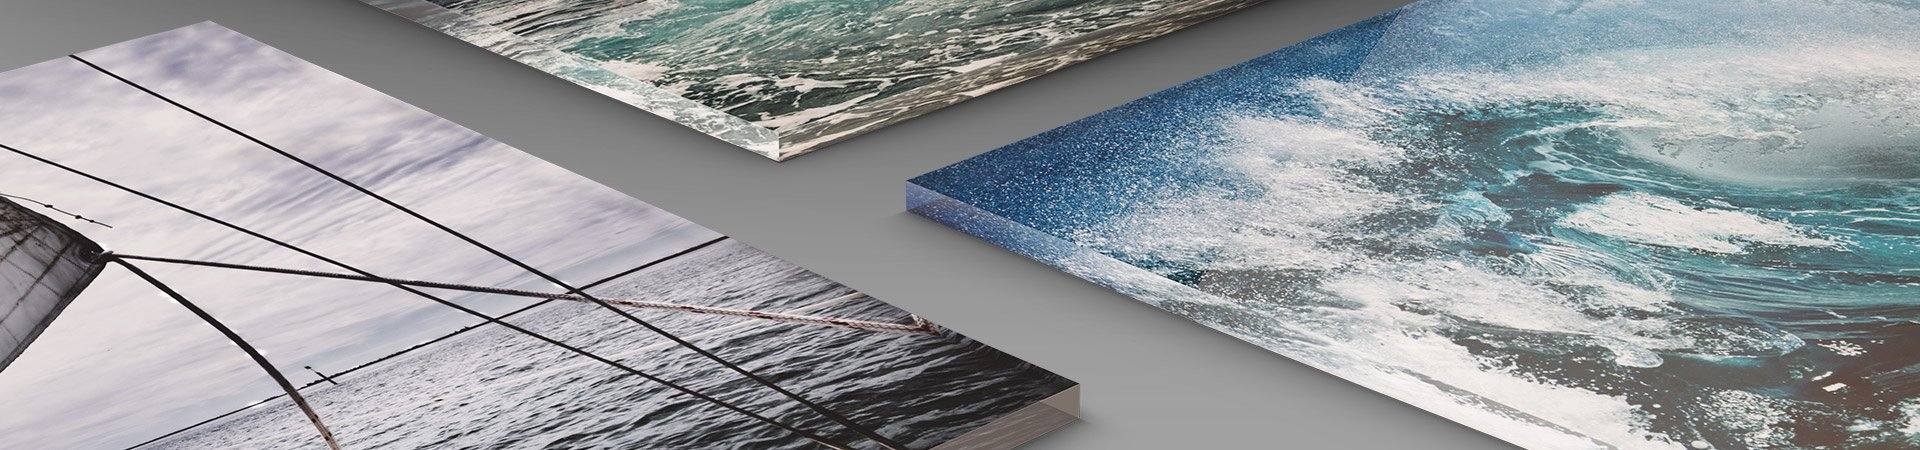 Professional acrylic photo prints